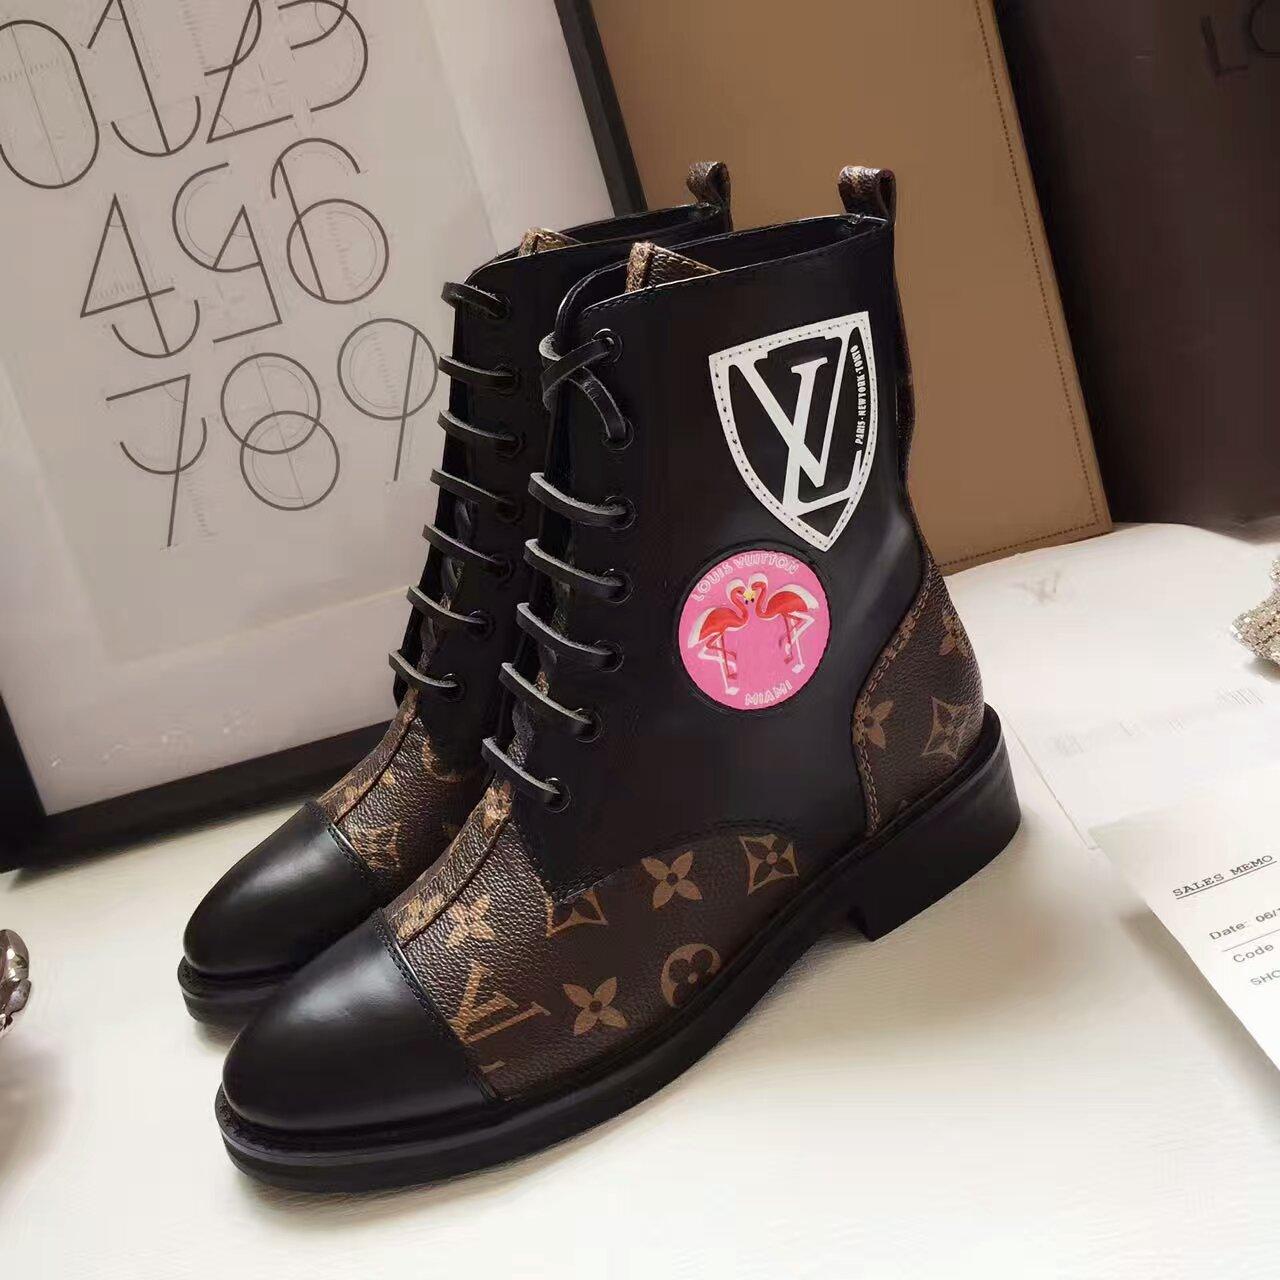 LV专柜新款 路易威登Louis Vuitton短靴市场高端产品质量